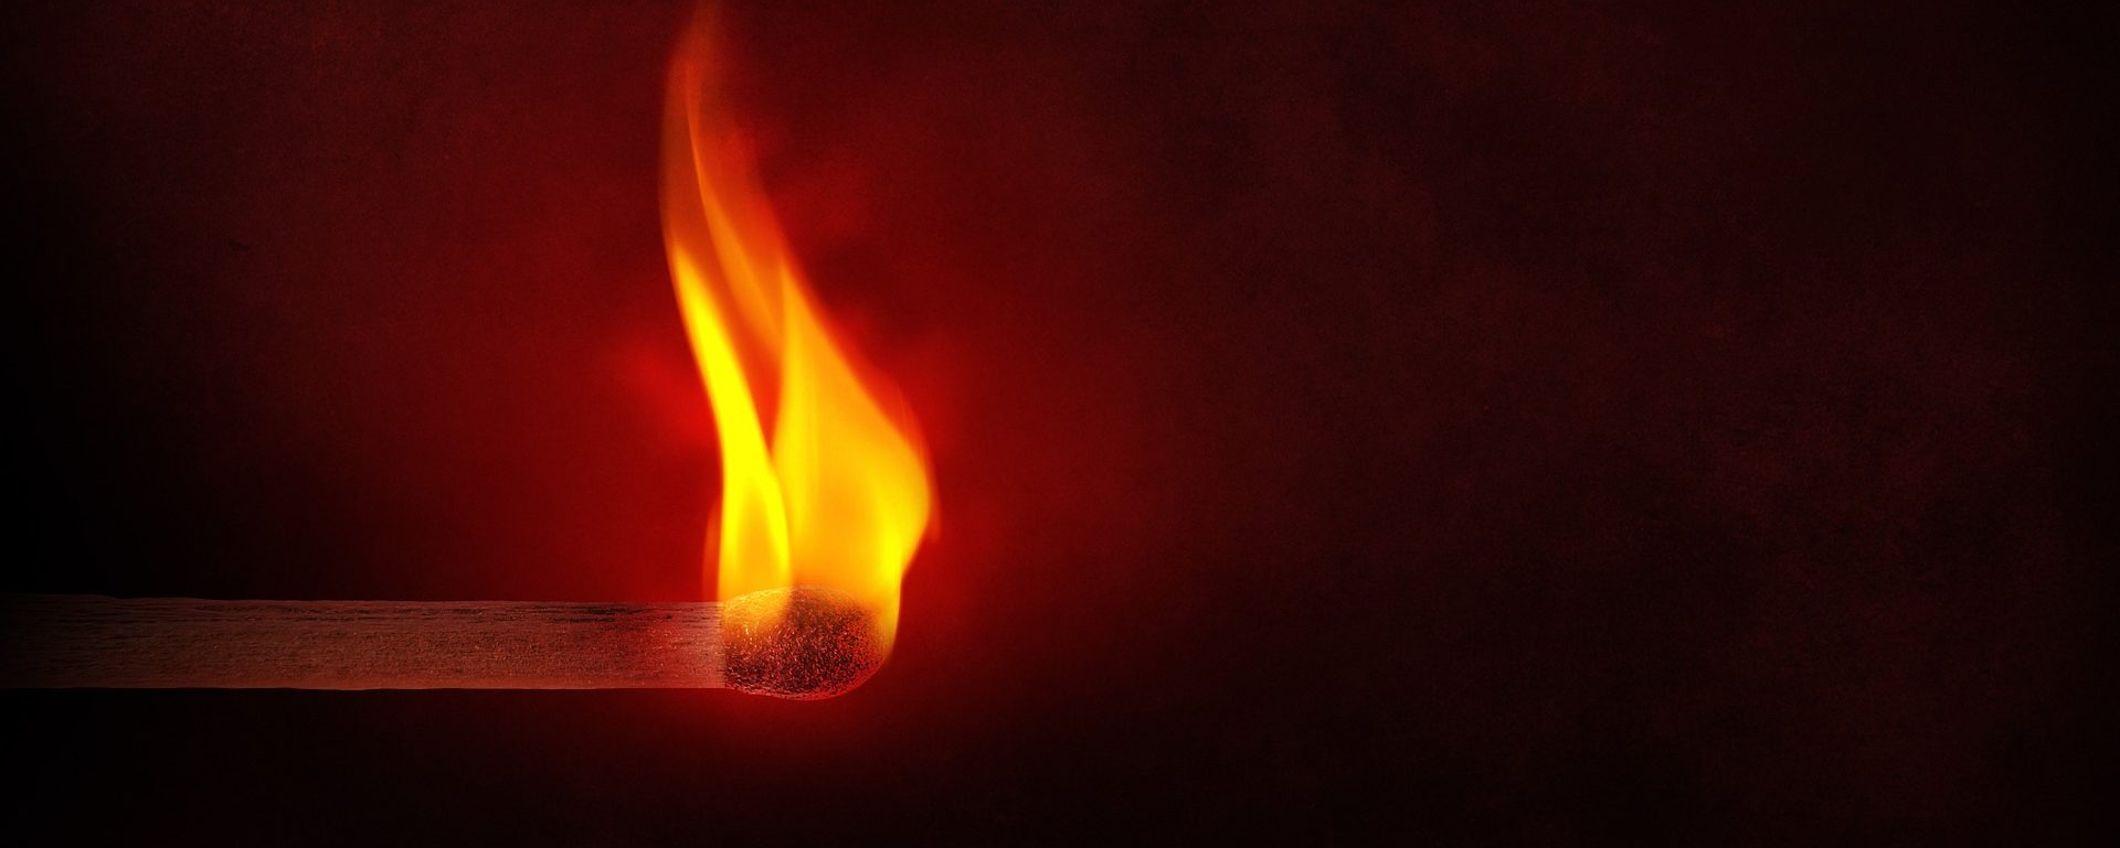 flame-1363003_1920-e1486547705349.jpg